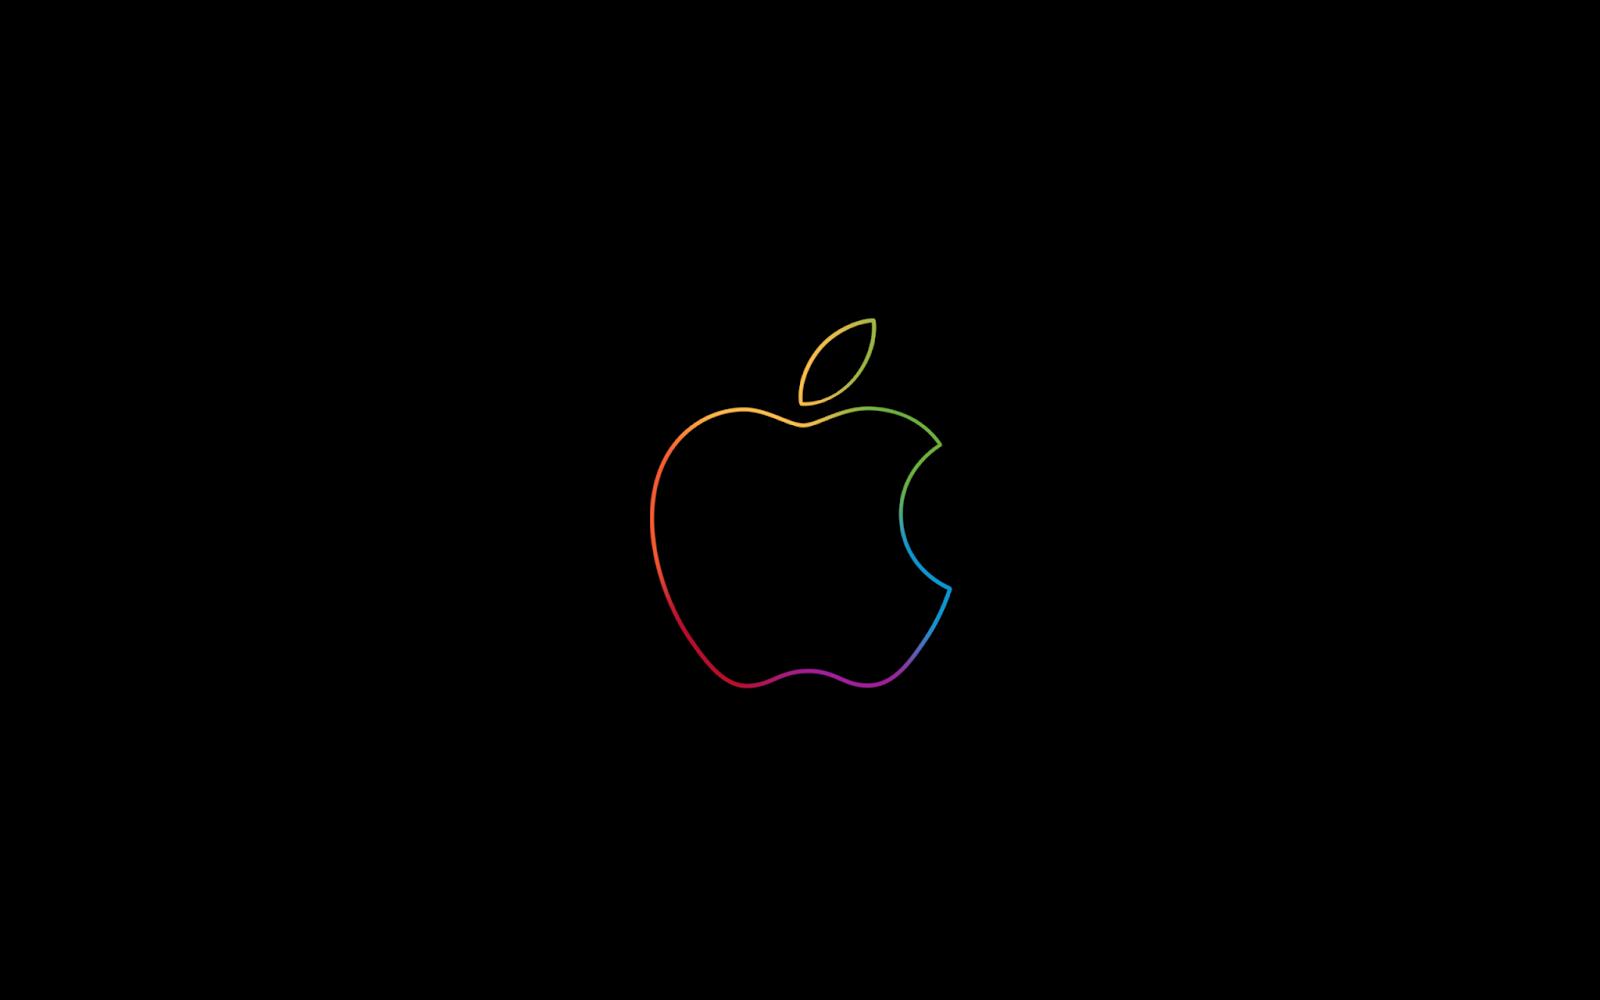 Apple Logo, Minimal, Colorful, Dark background, HD, Technology